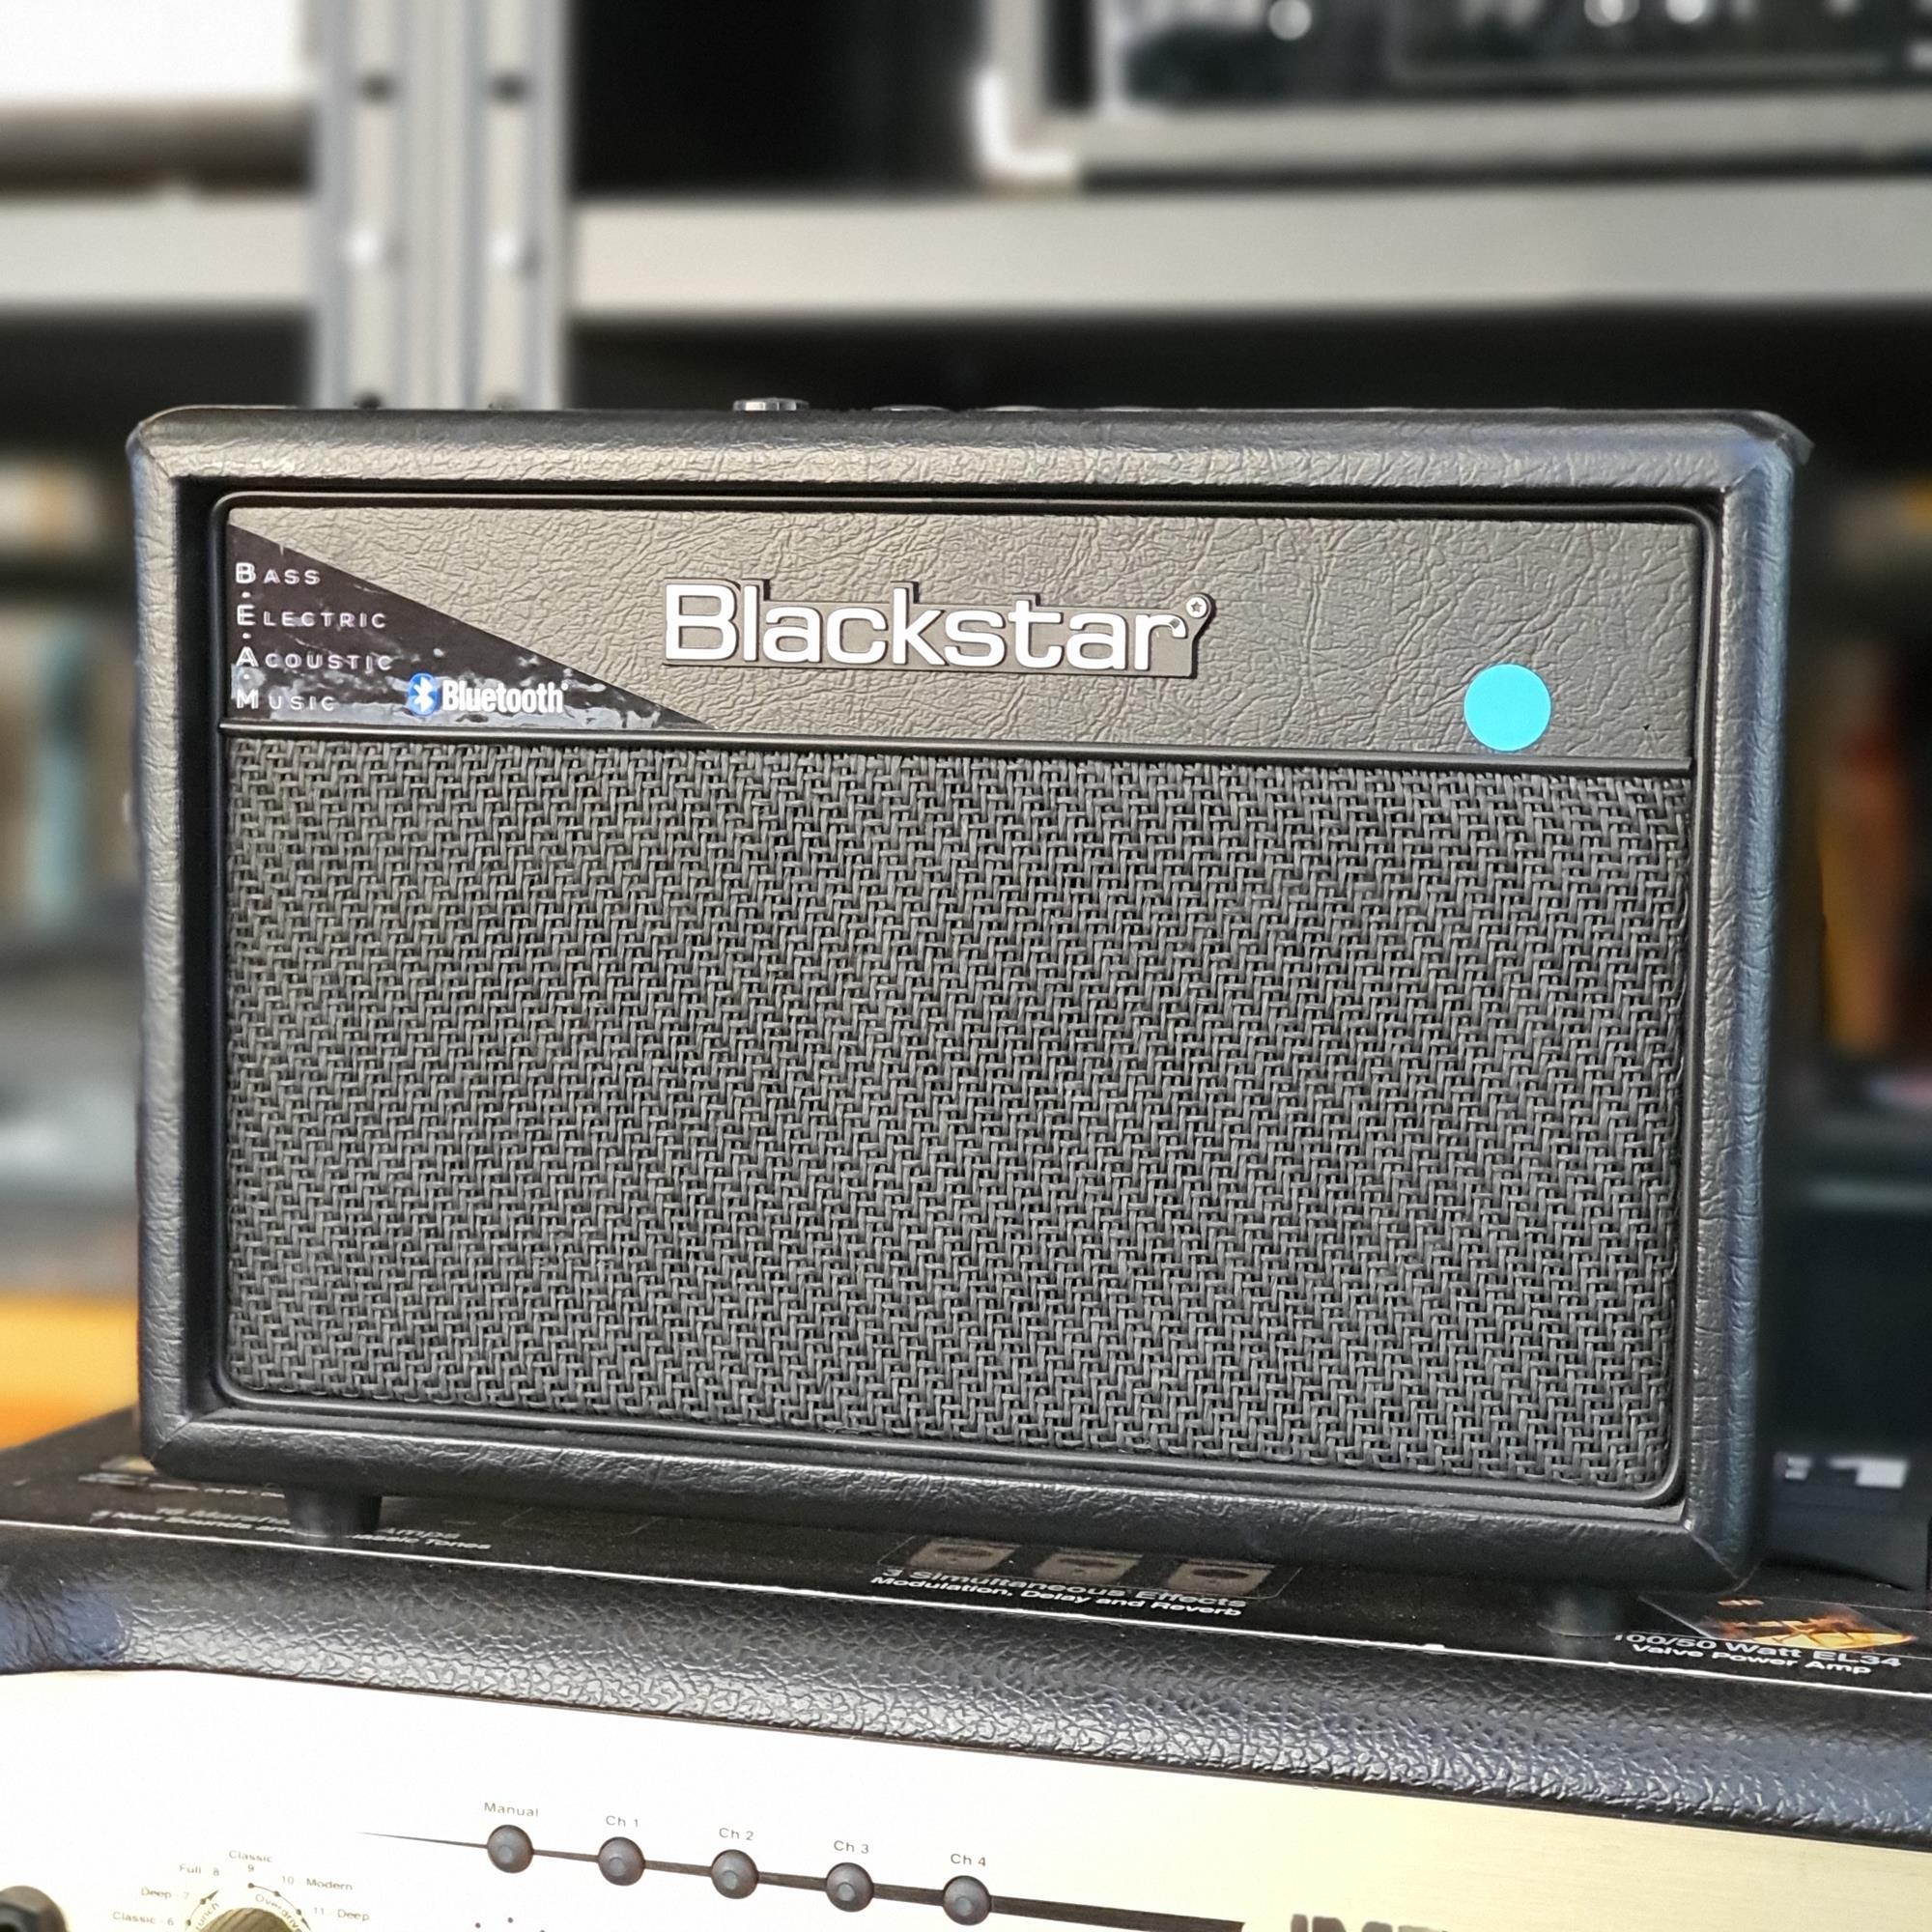 BLACKSTAR-BEAM-sku-1631985673820